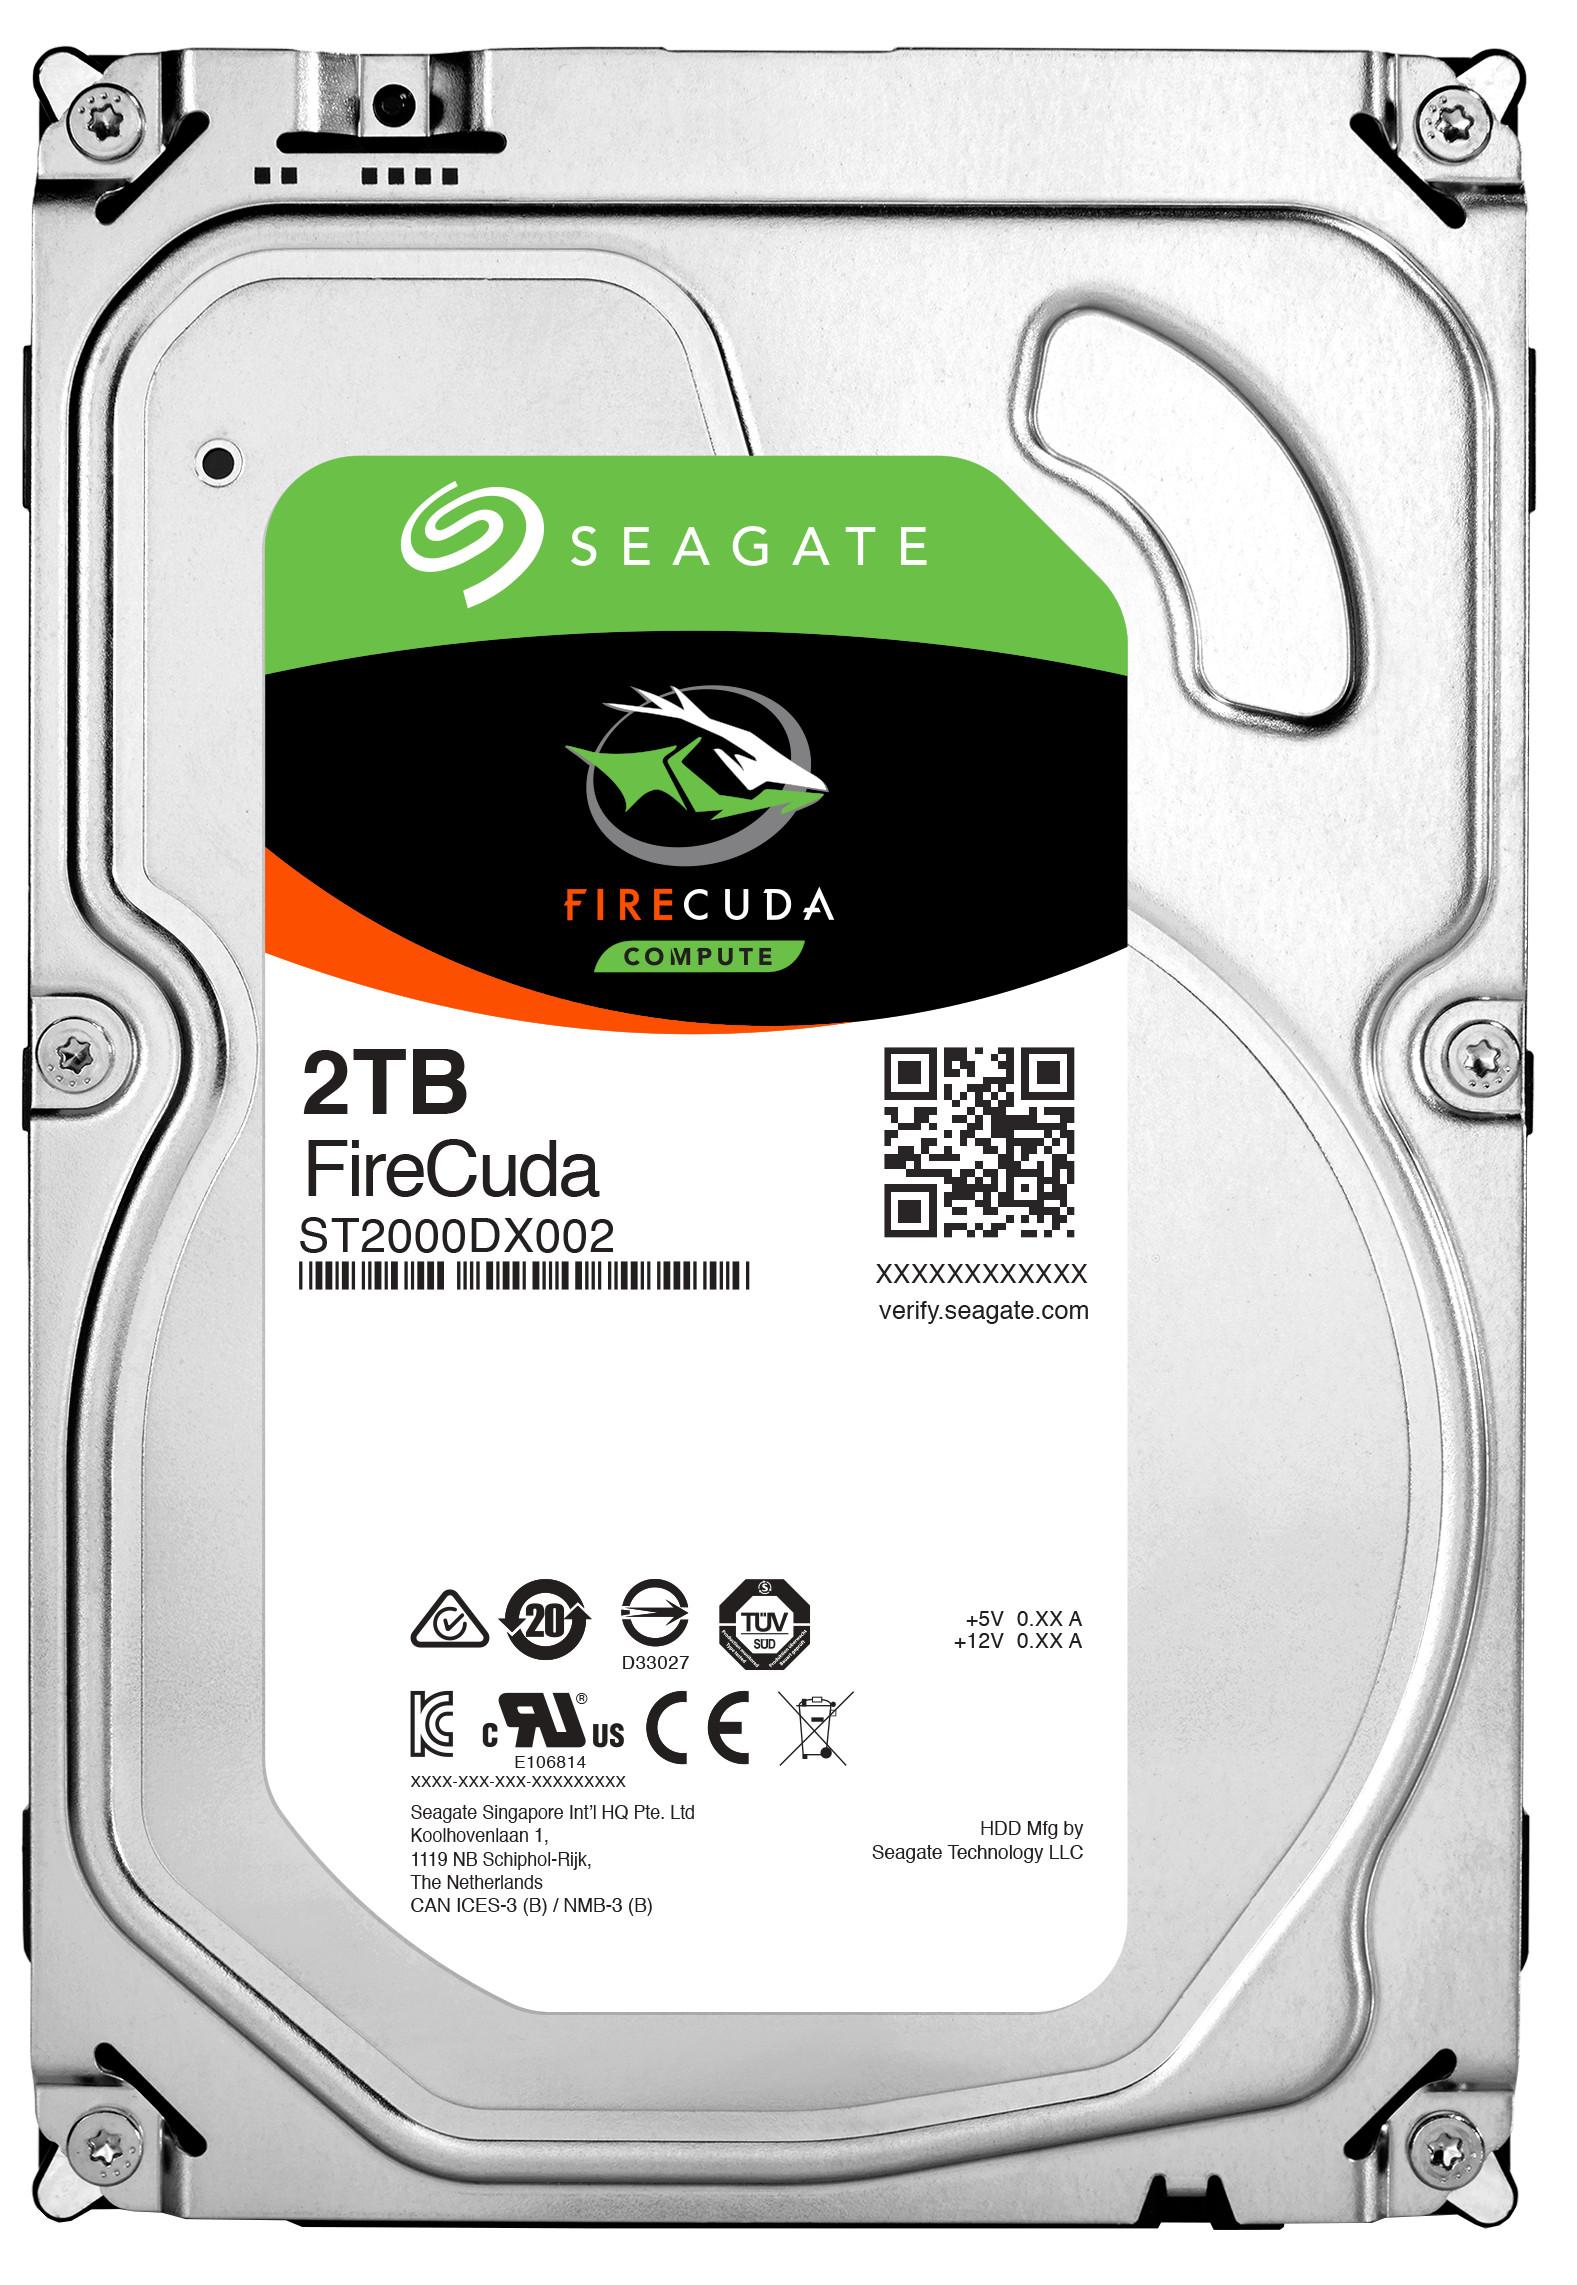 Seagate FireCuda ST2000DX002 2 TB